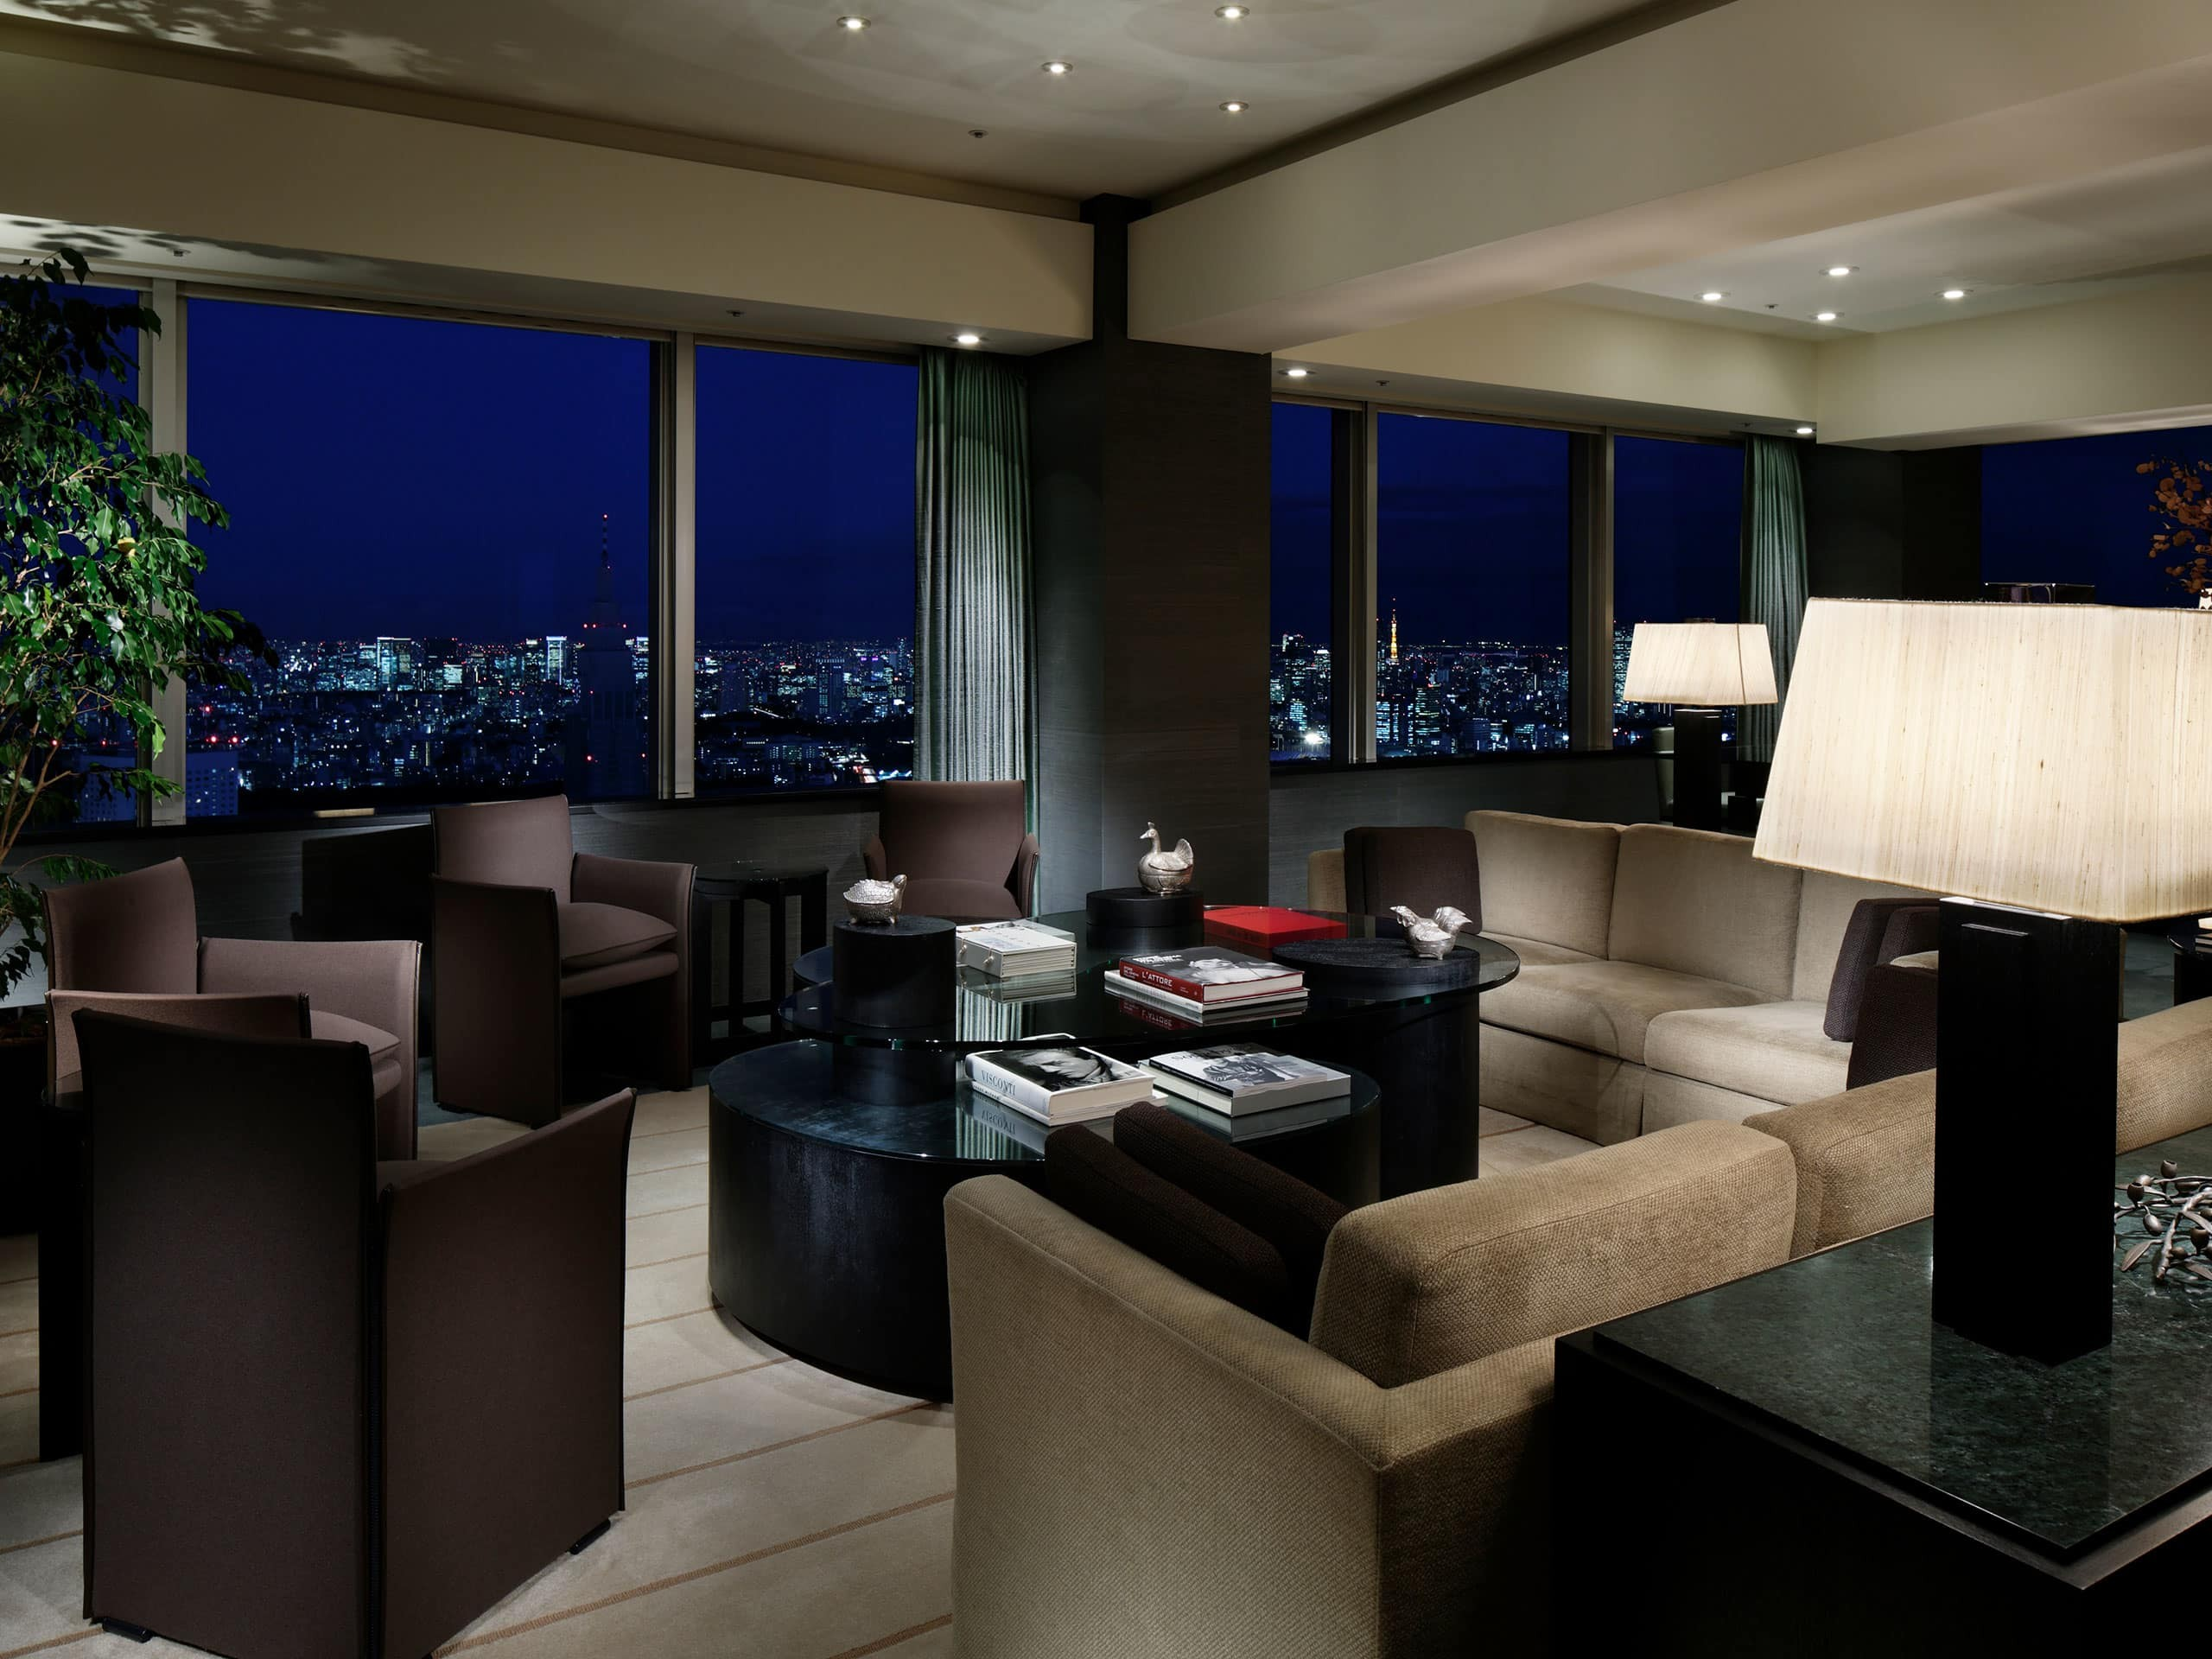 Park Hyatt tokyo Hotel Elegant 5 Star Luxury Hotels In Shinjuku Japan Park Hyatt tokyo